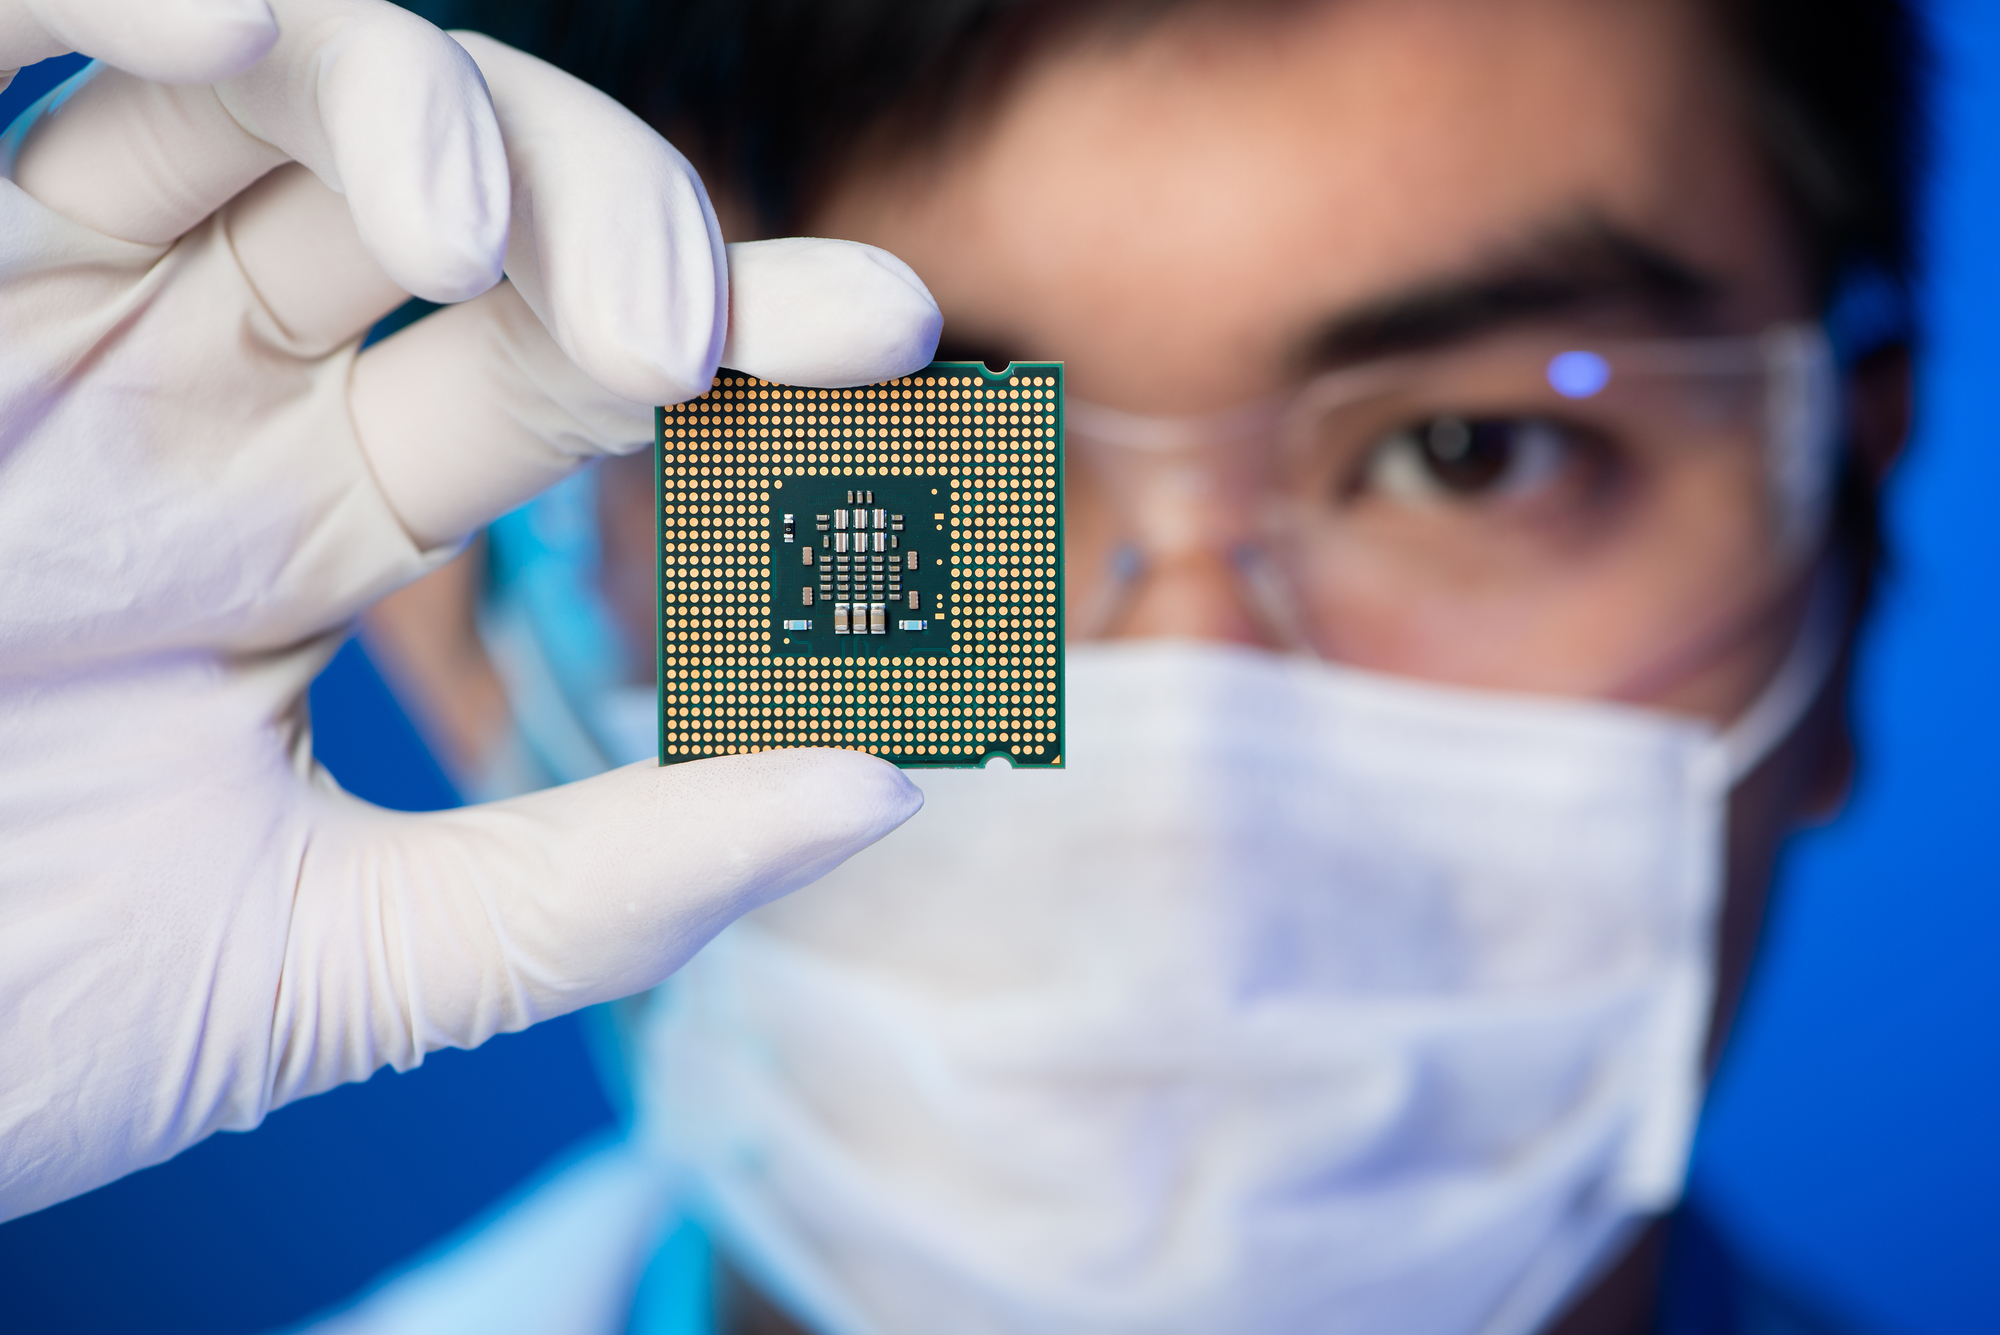 扩产14nm+备战10nm和7nm,英特尔CPU缺货问题或逐季舒缓